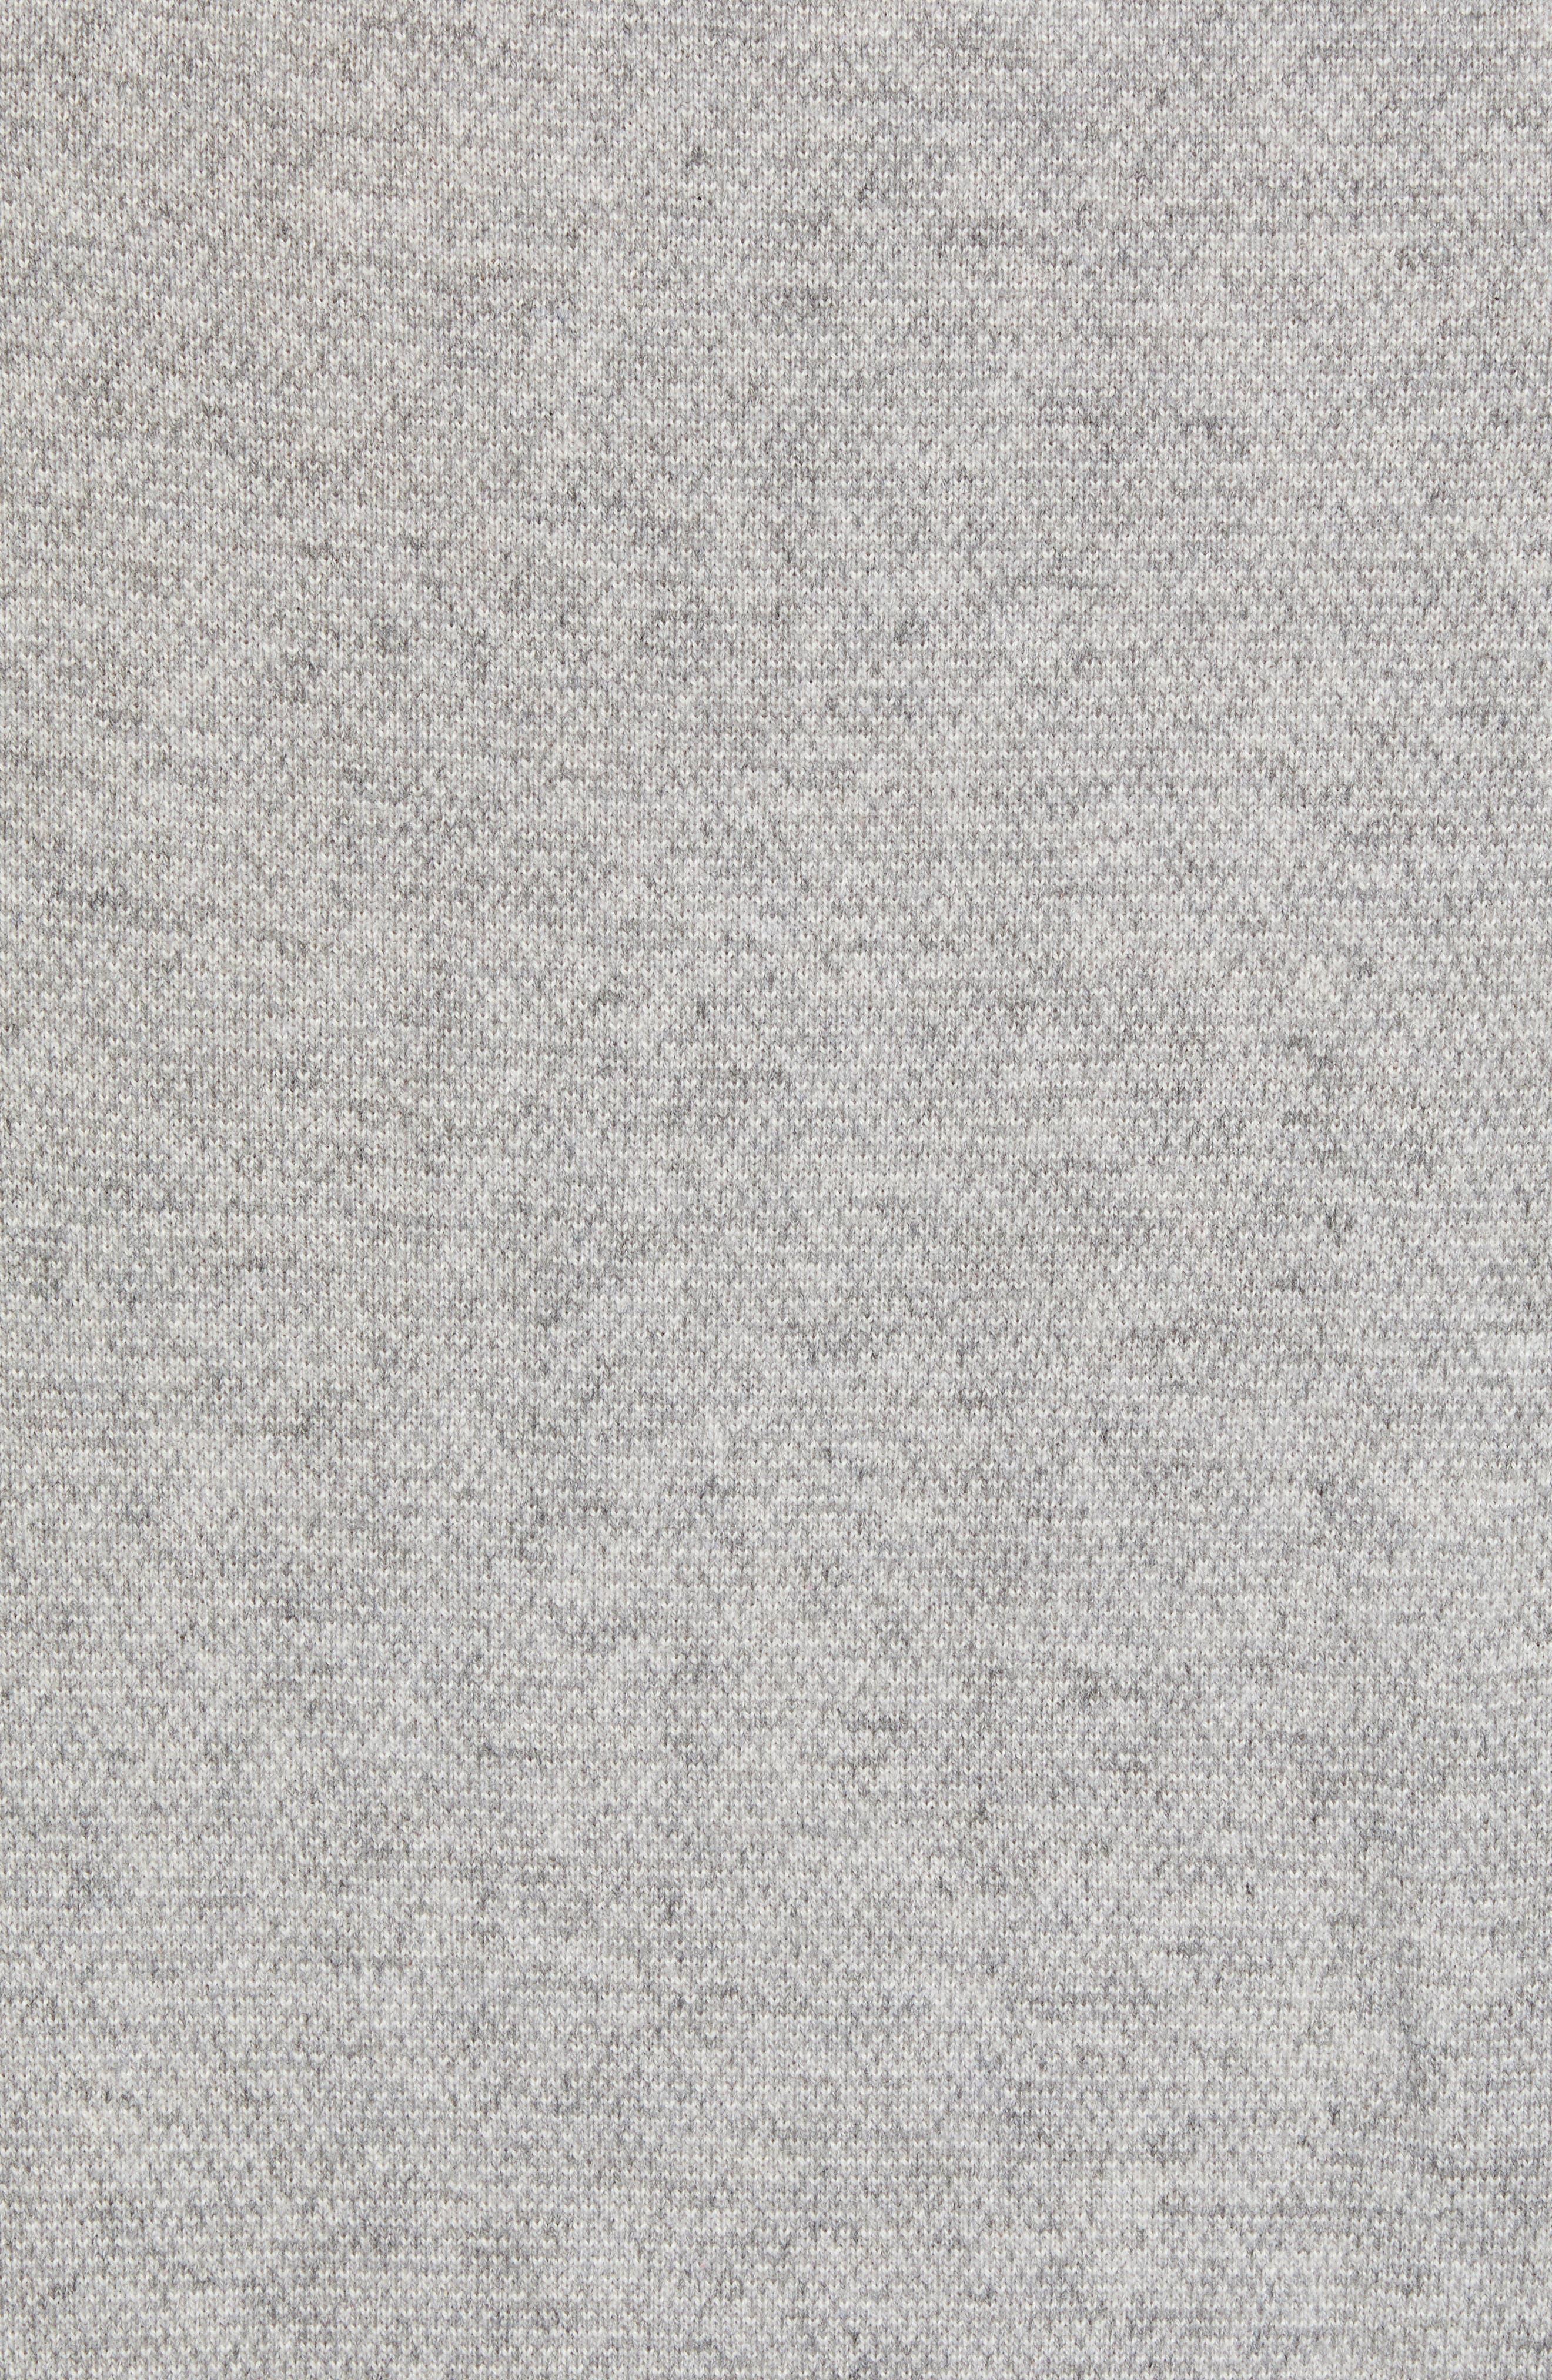 Bird's Eye Sweater,                             Alternate thumbnail 5, color,                             H GREY/ PEARL